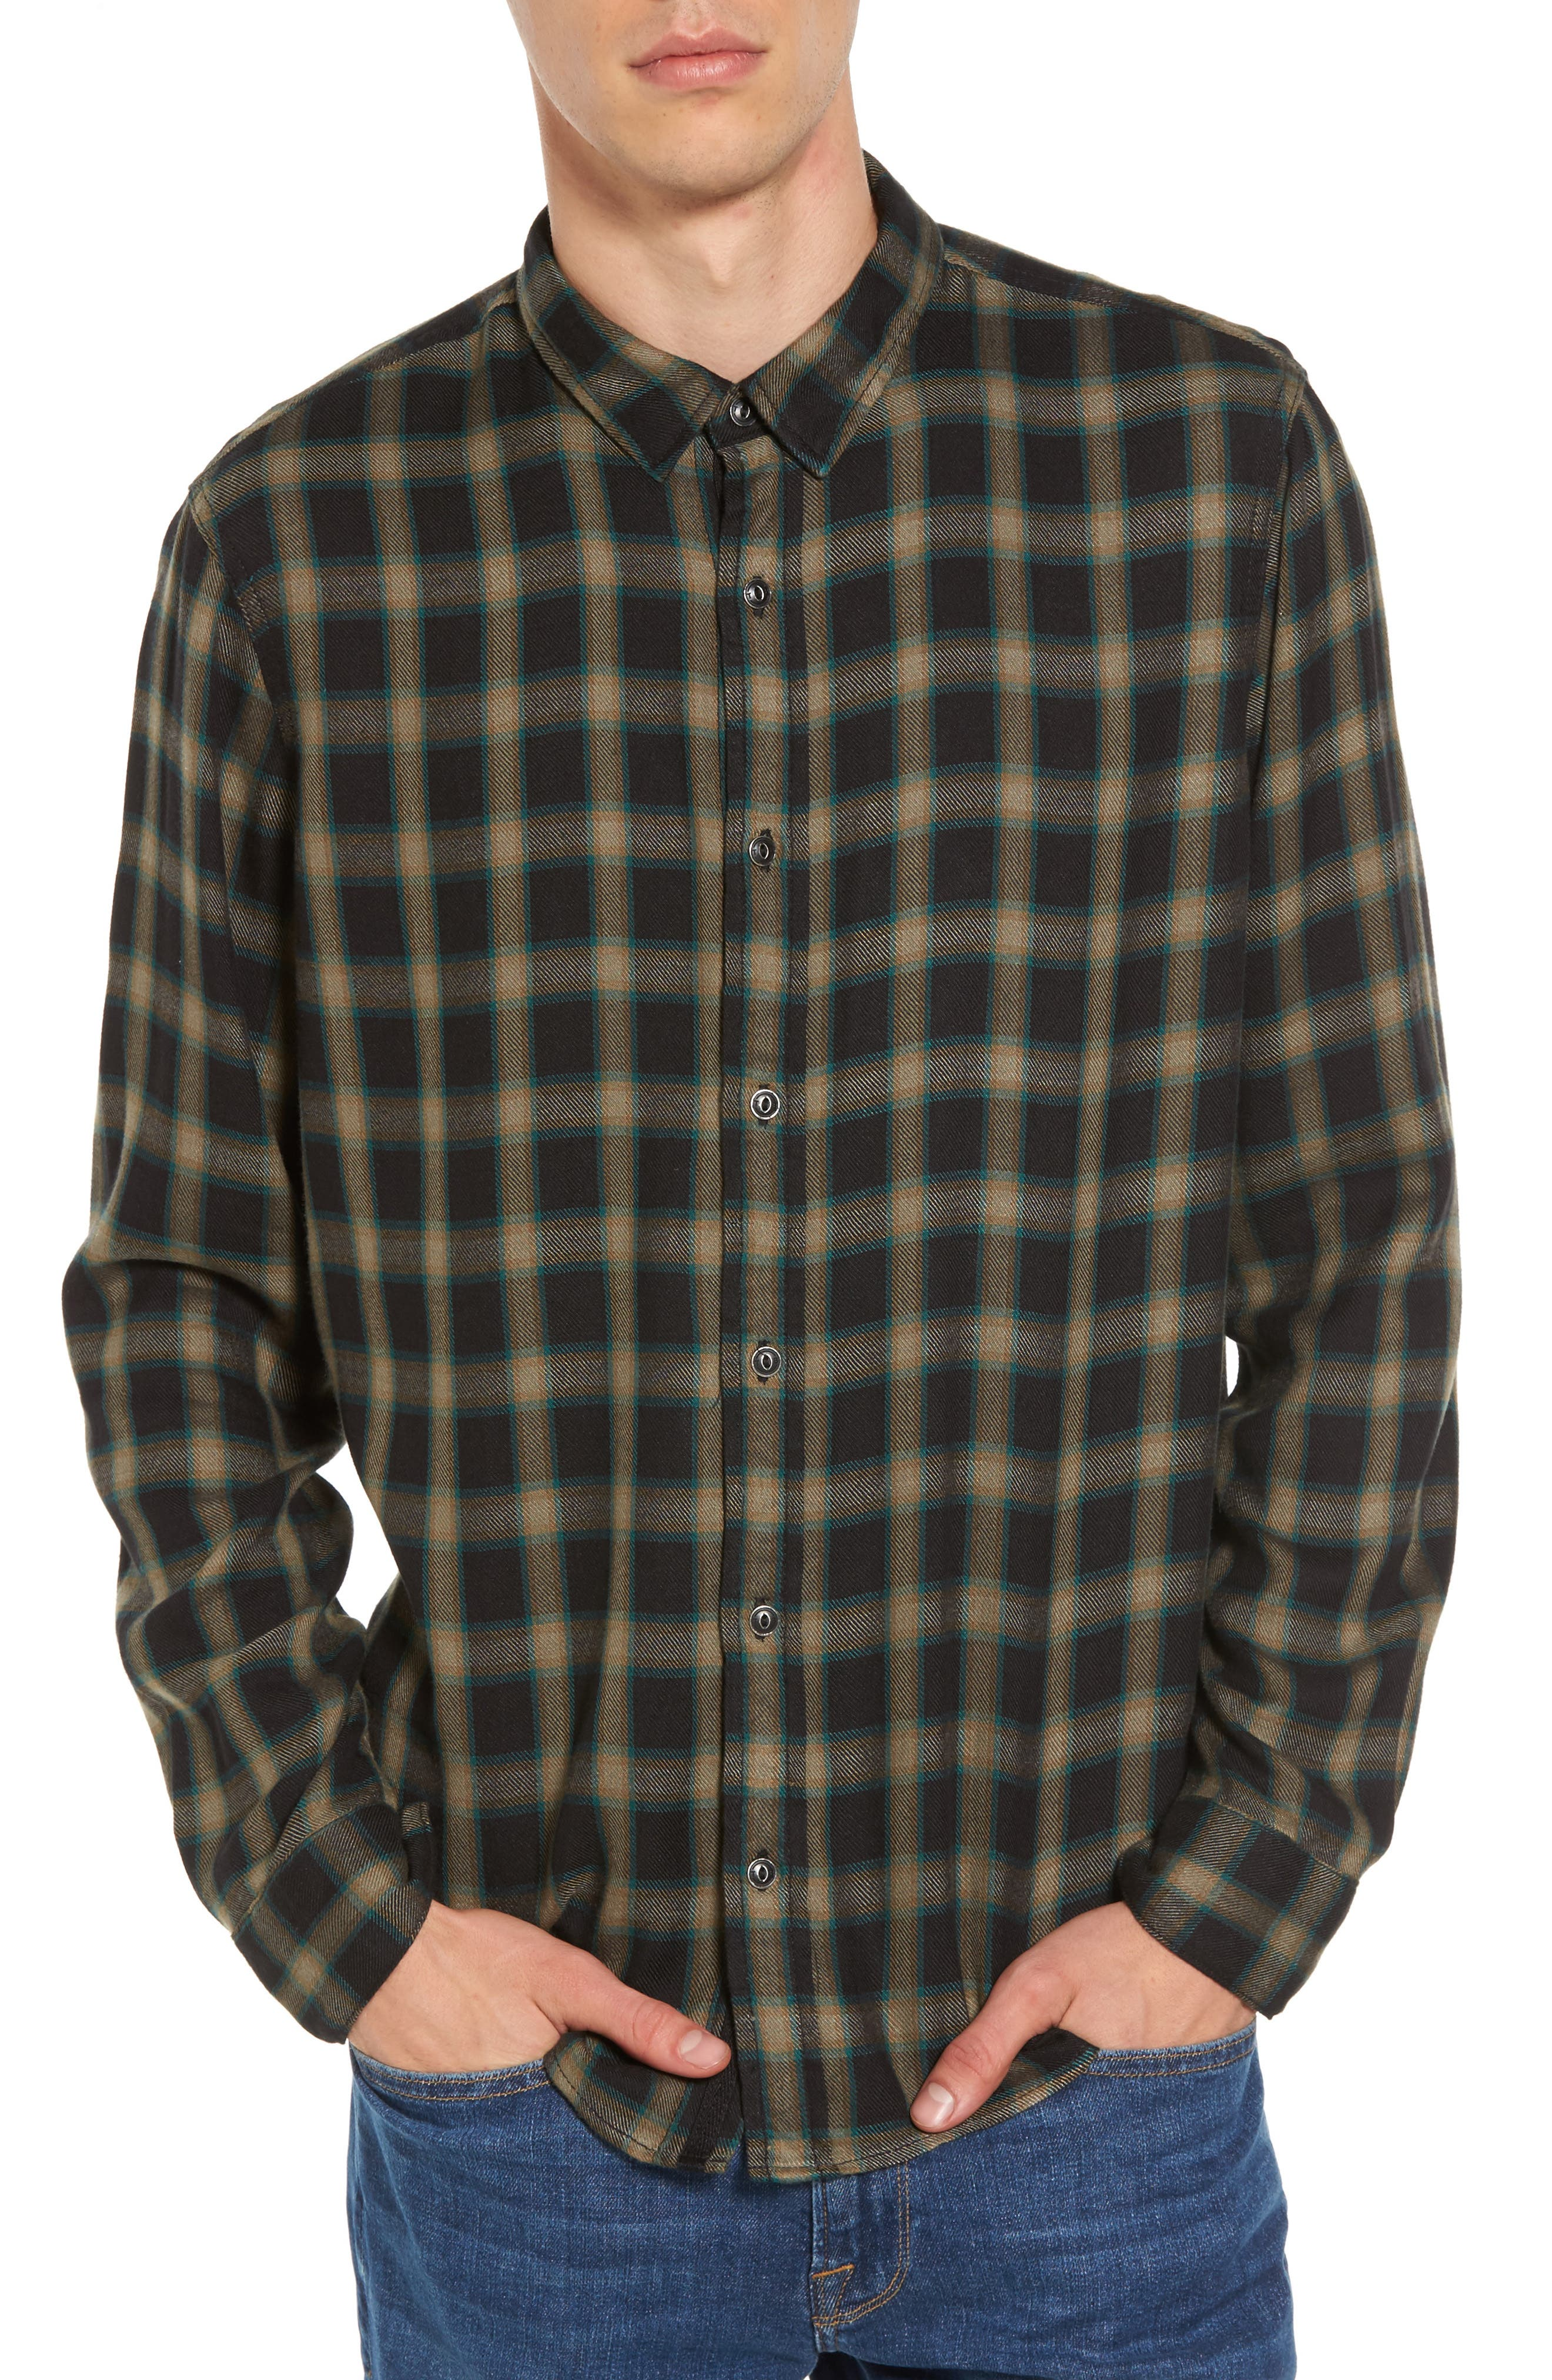 Virgil Plaid Sport Shirt,                             Main thumbnail 1, color,                             Black Rock Green Edocha Plaid